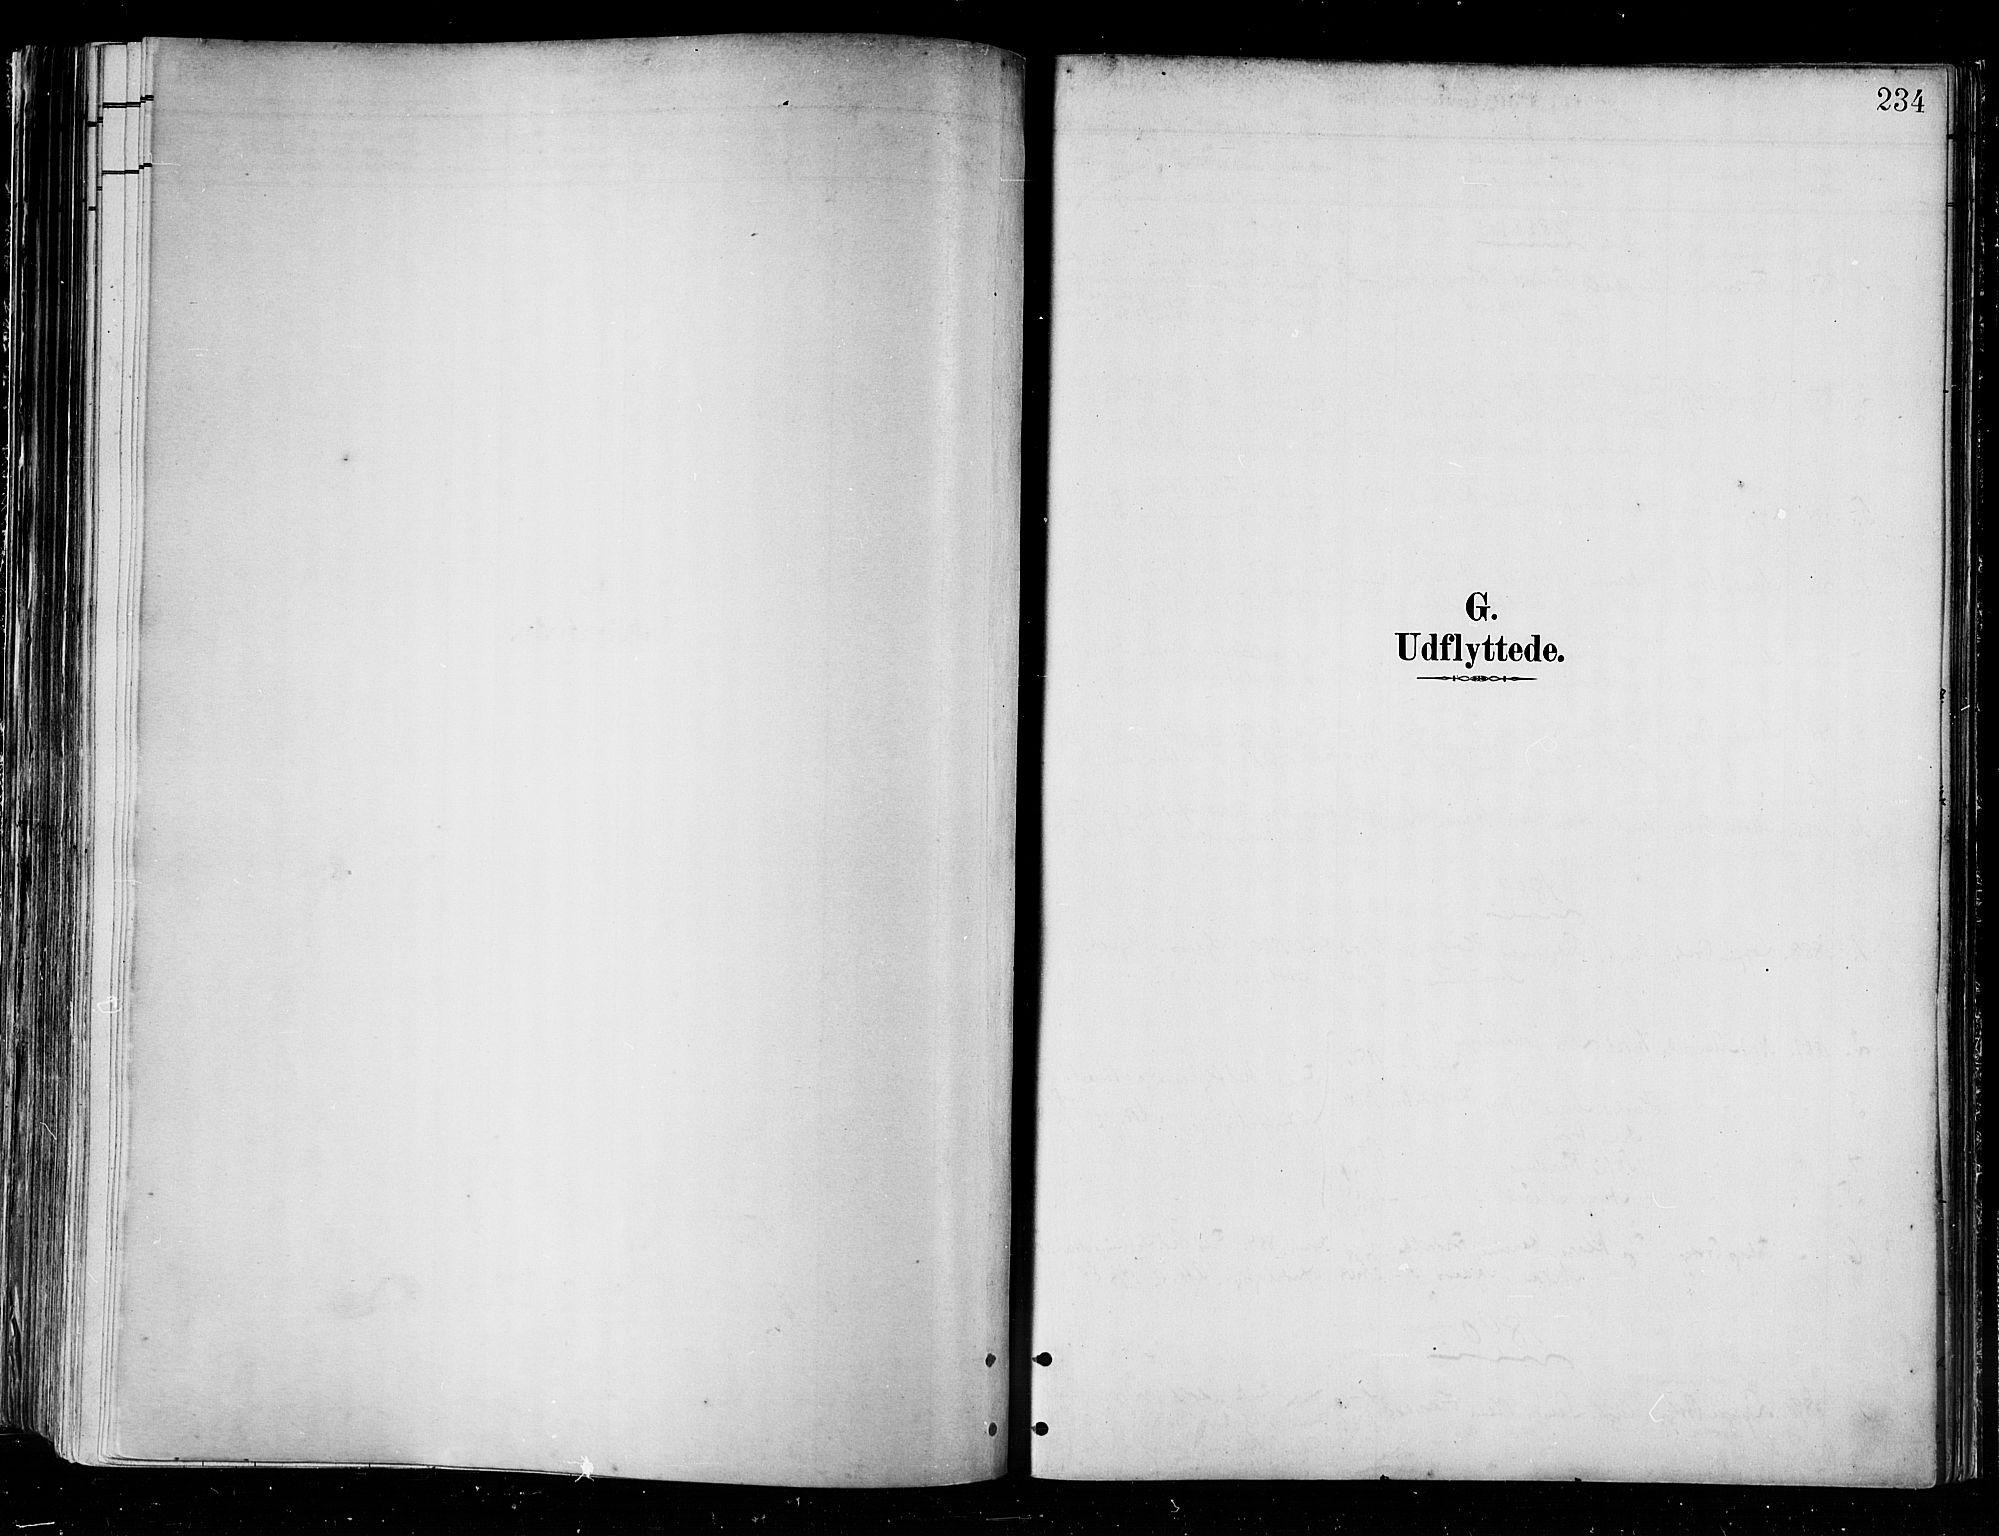 SATØ, Skjervøy sokneprestkontor, H/Ha/Haa/L0010kirke: Ministerialbok nr. 10, 1887-1898, s. 234